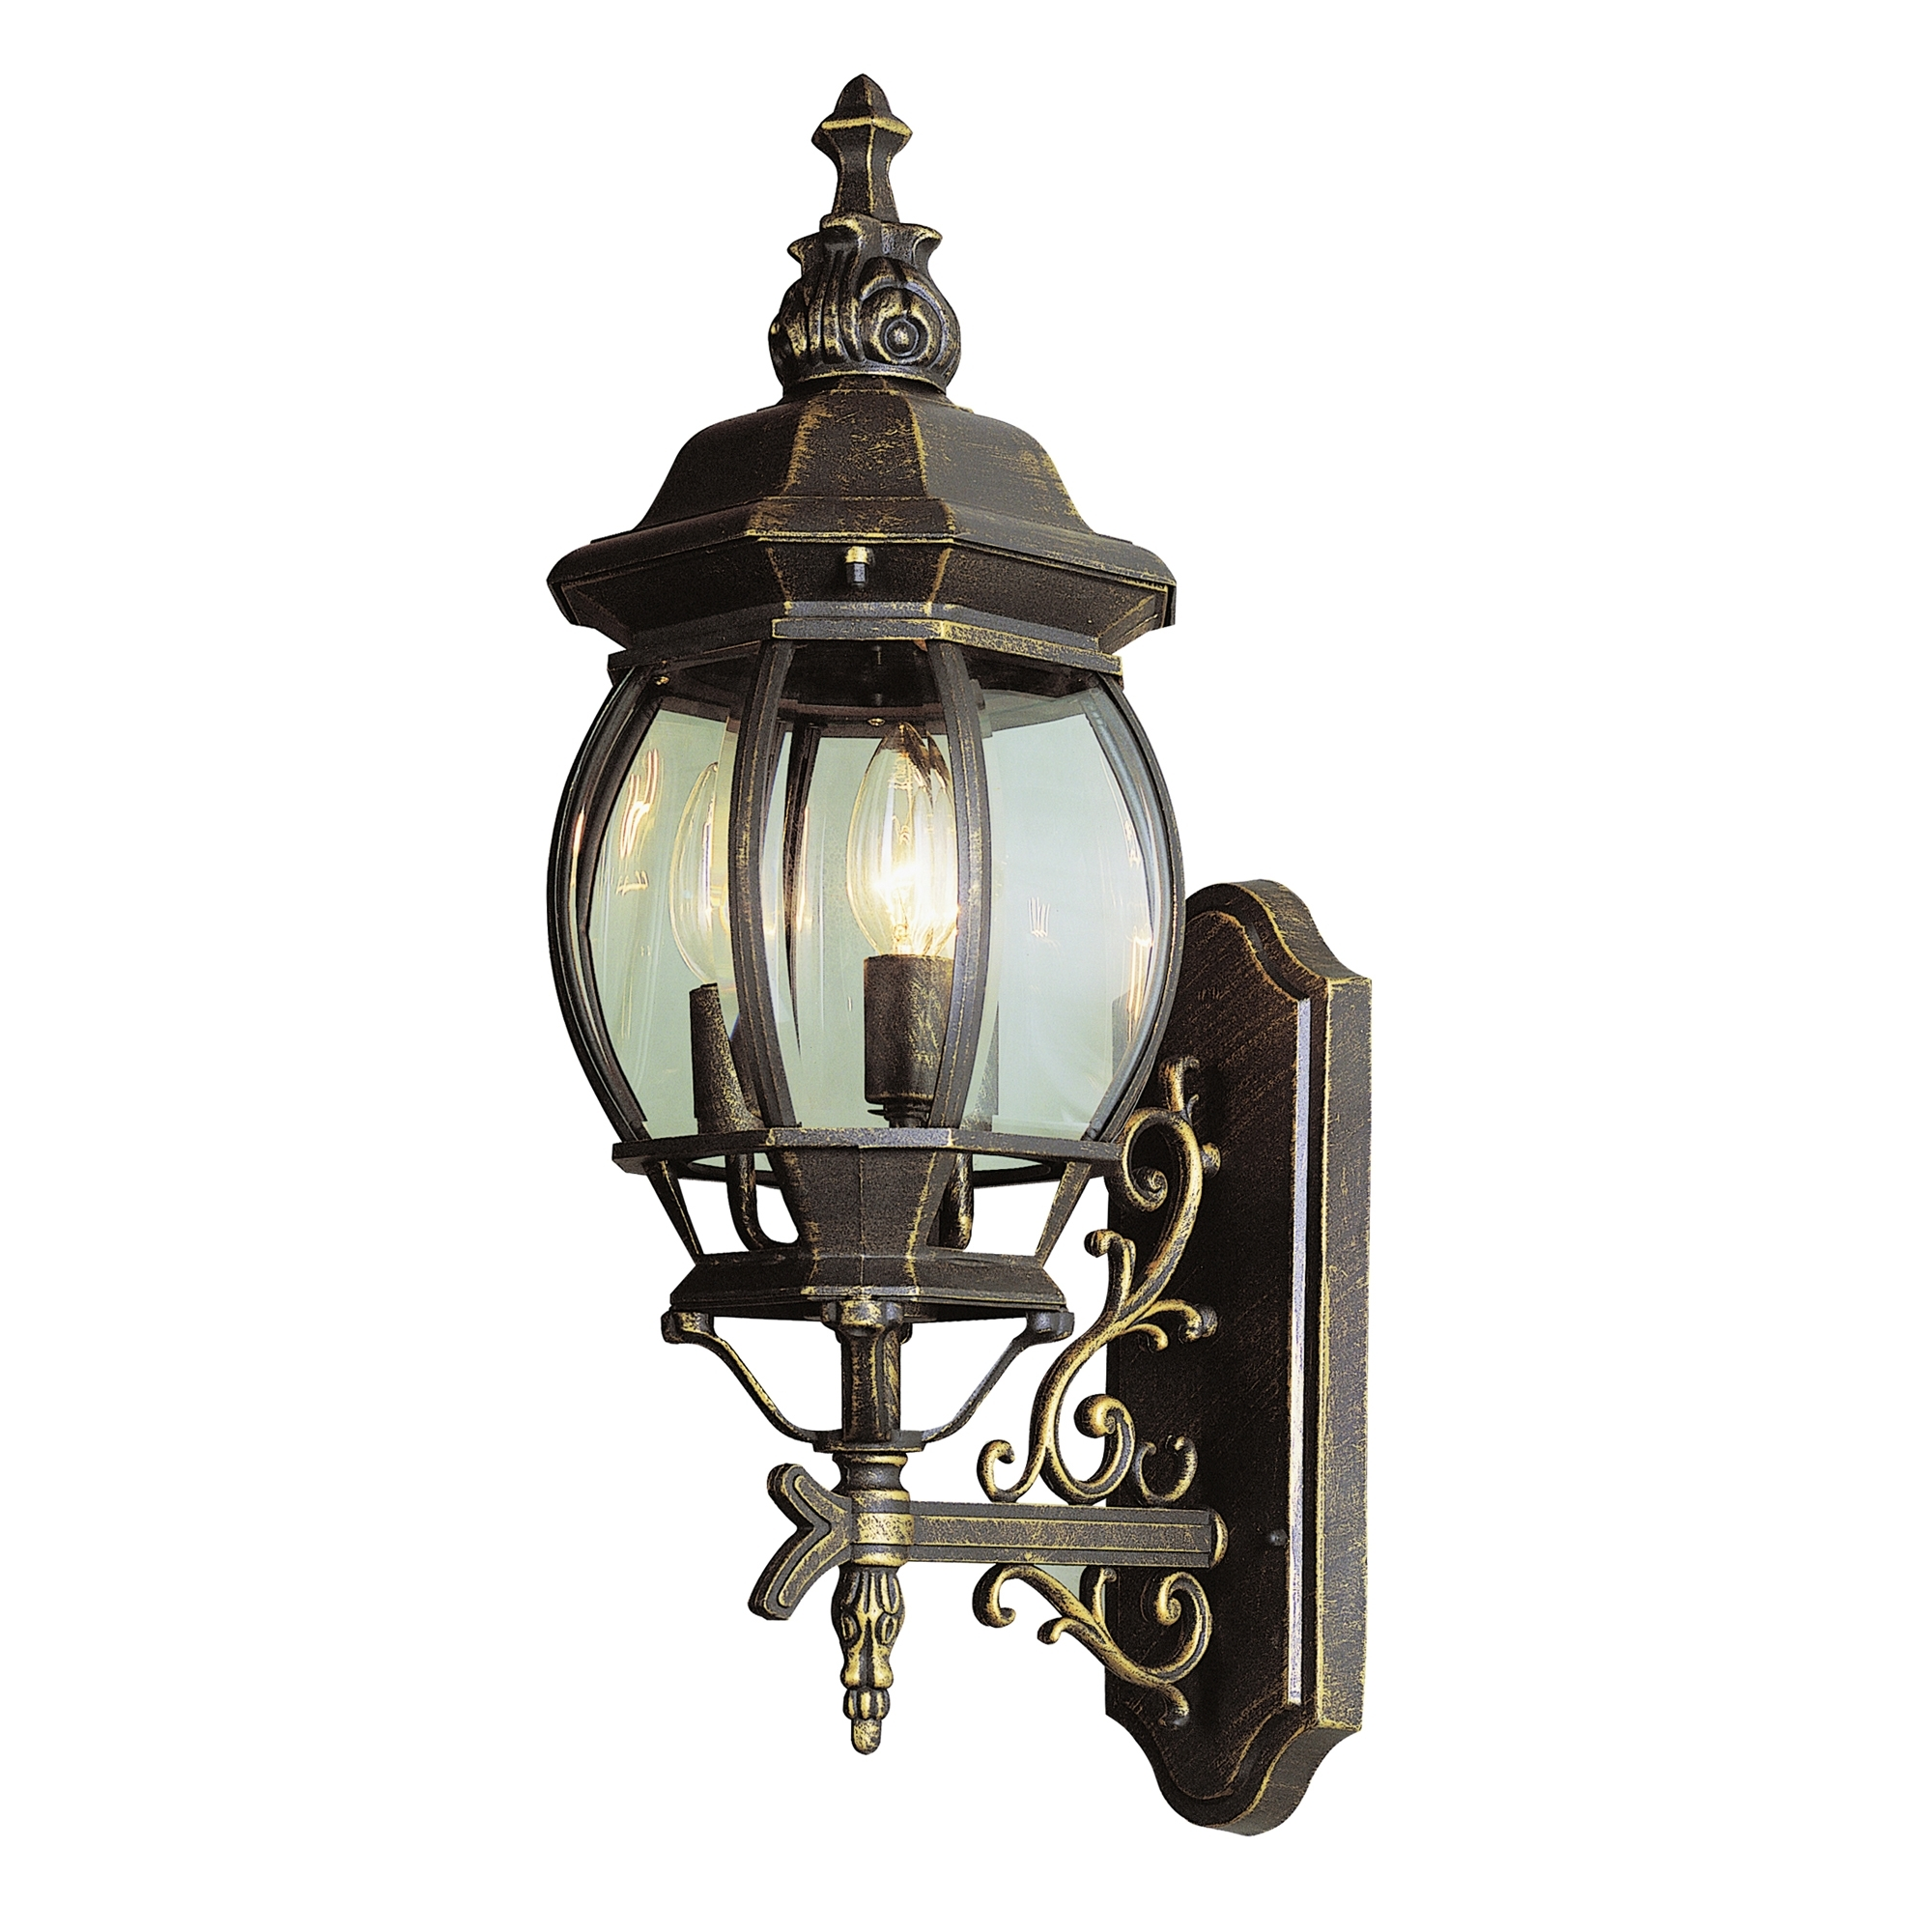 Inspiration about Trans Globe 4051 Bg Rochelle Black Gold Outdoor Wall Sconce: Littman Regarding Outdoor Wall Lantern By Transglobe Lighting (#8 of 15)